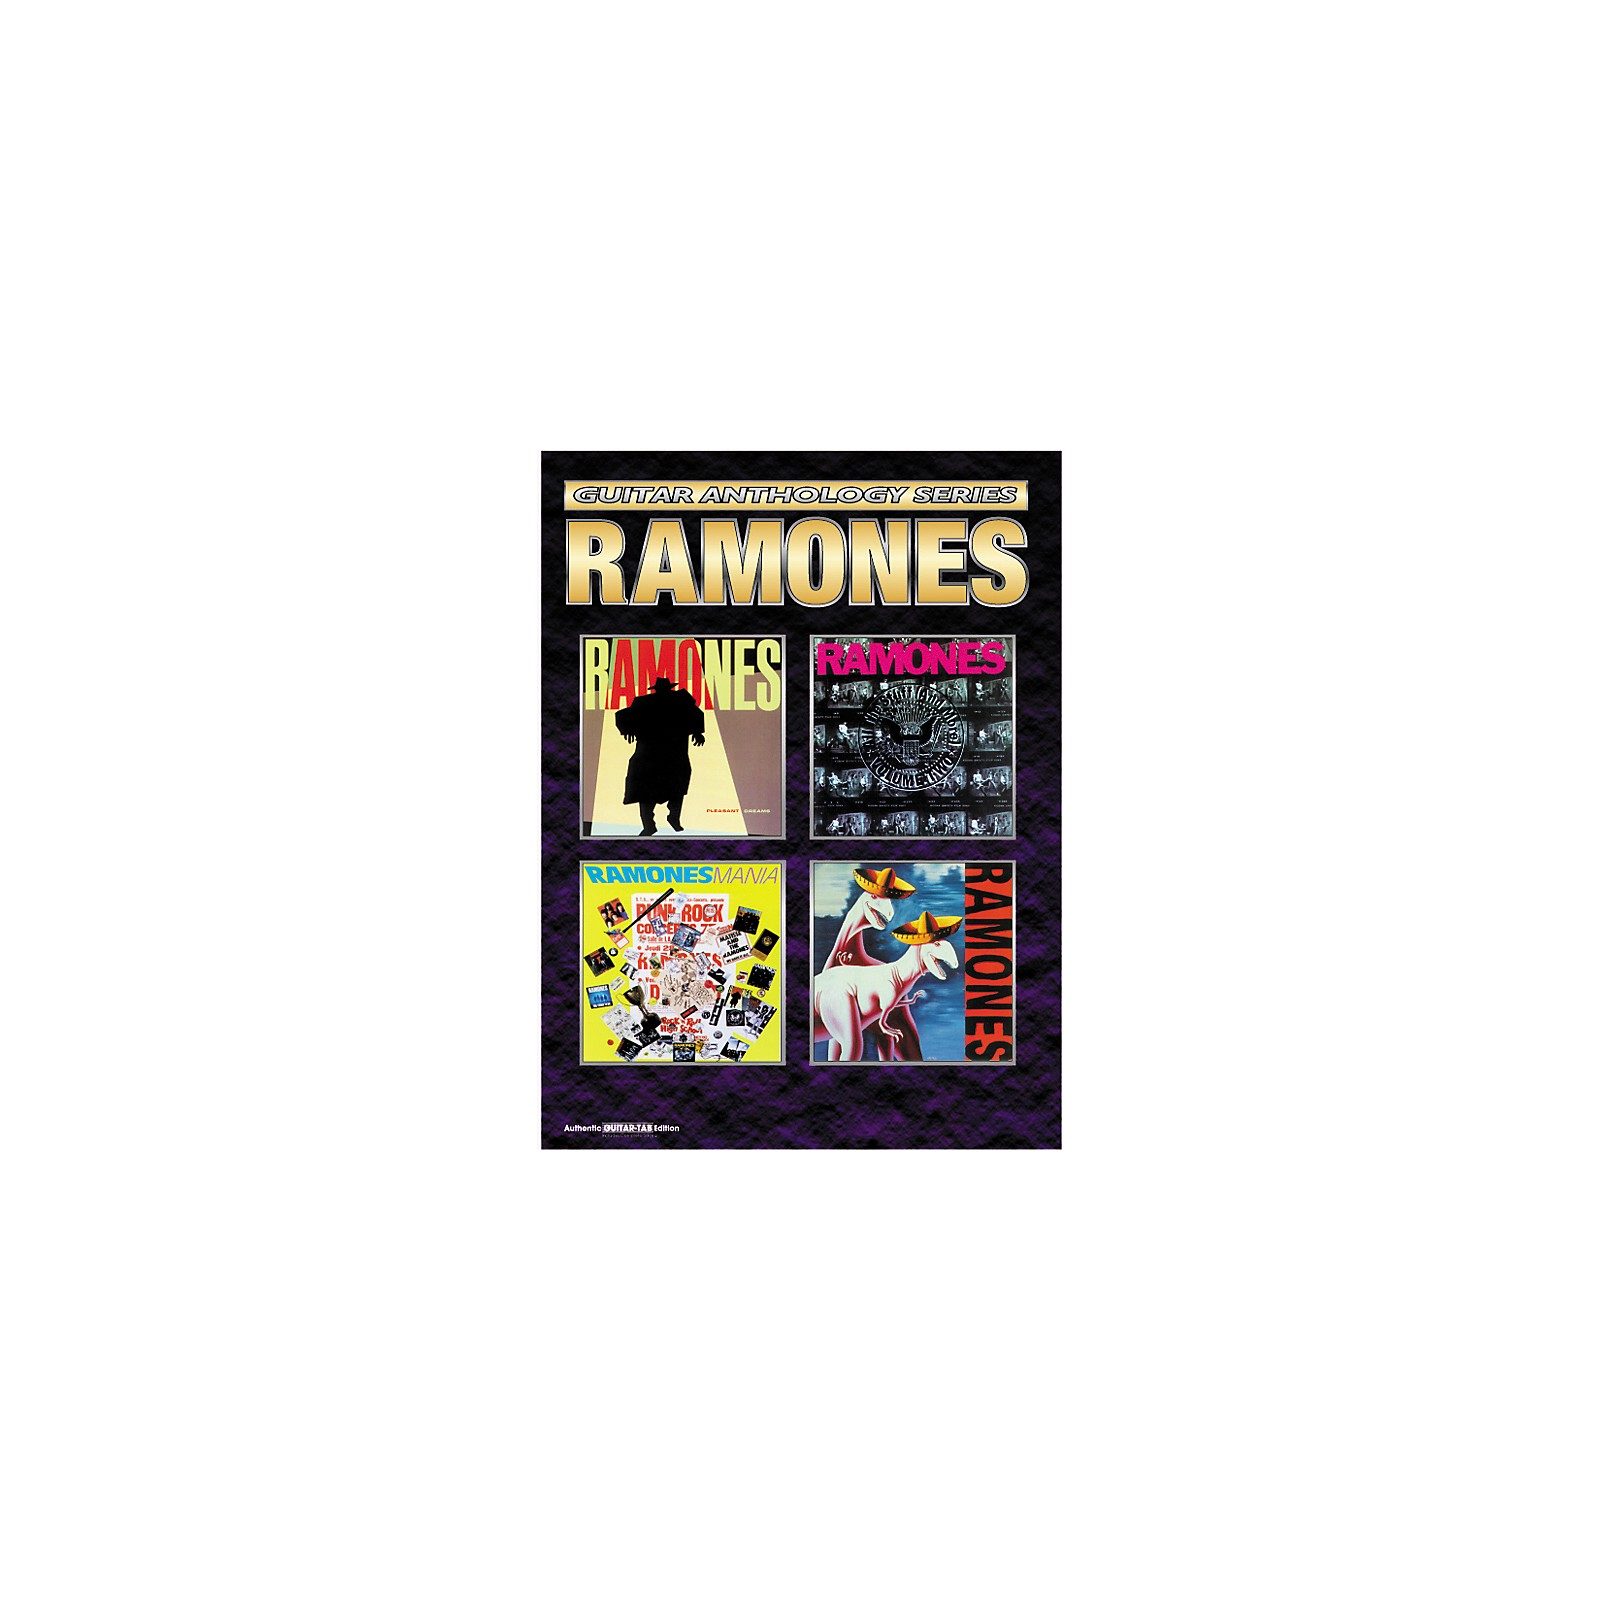 Alfred Ramones Anthology Series Guitar Tab Book